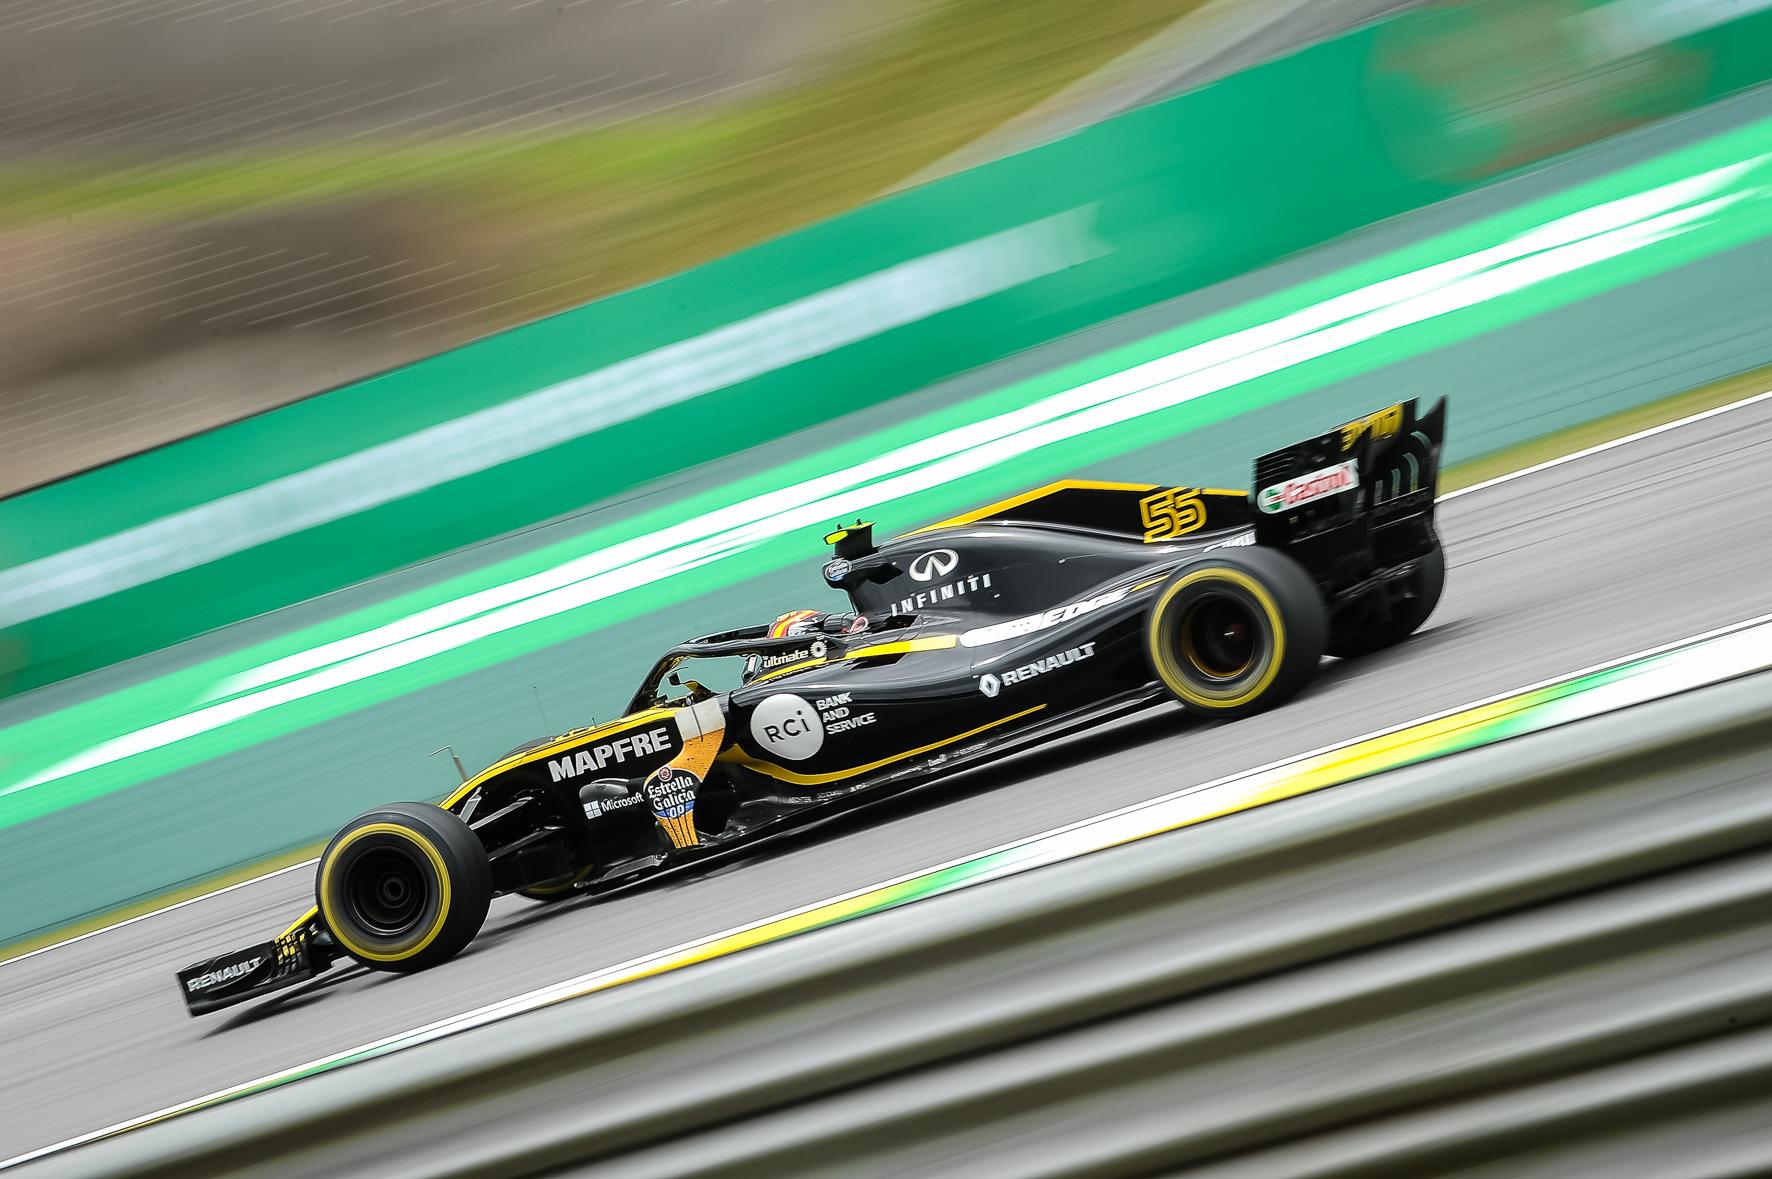 GPBrasil2018_dudabairros_Renault-31014